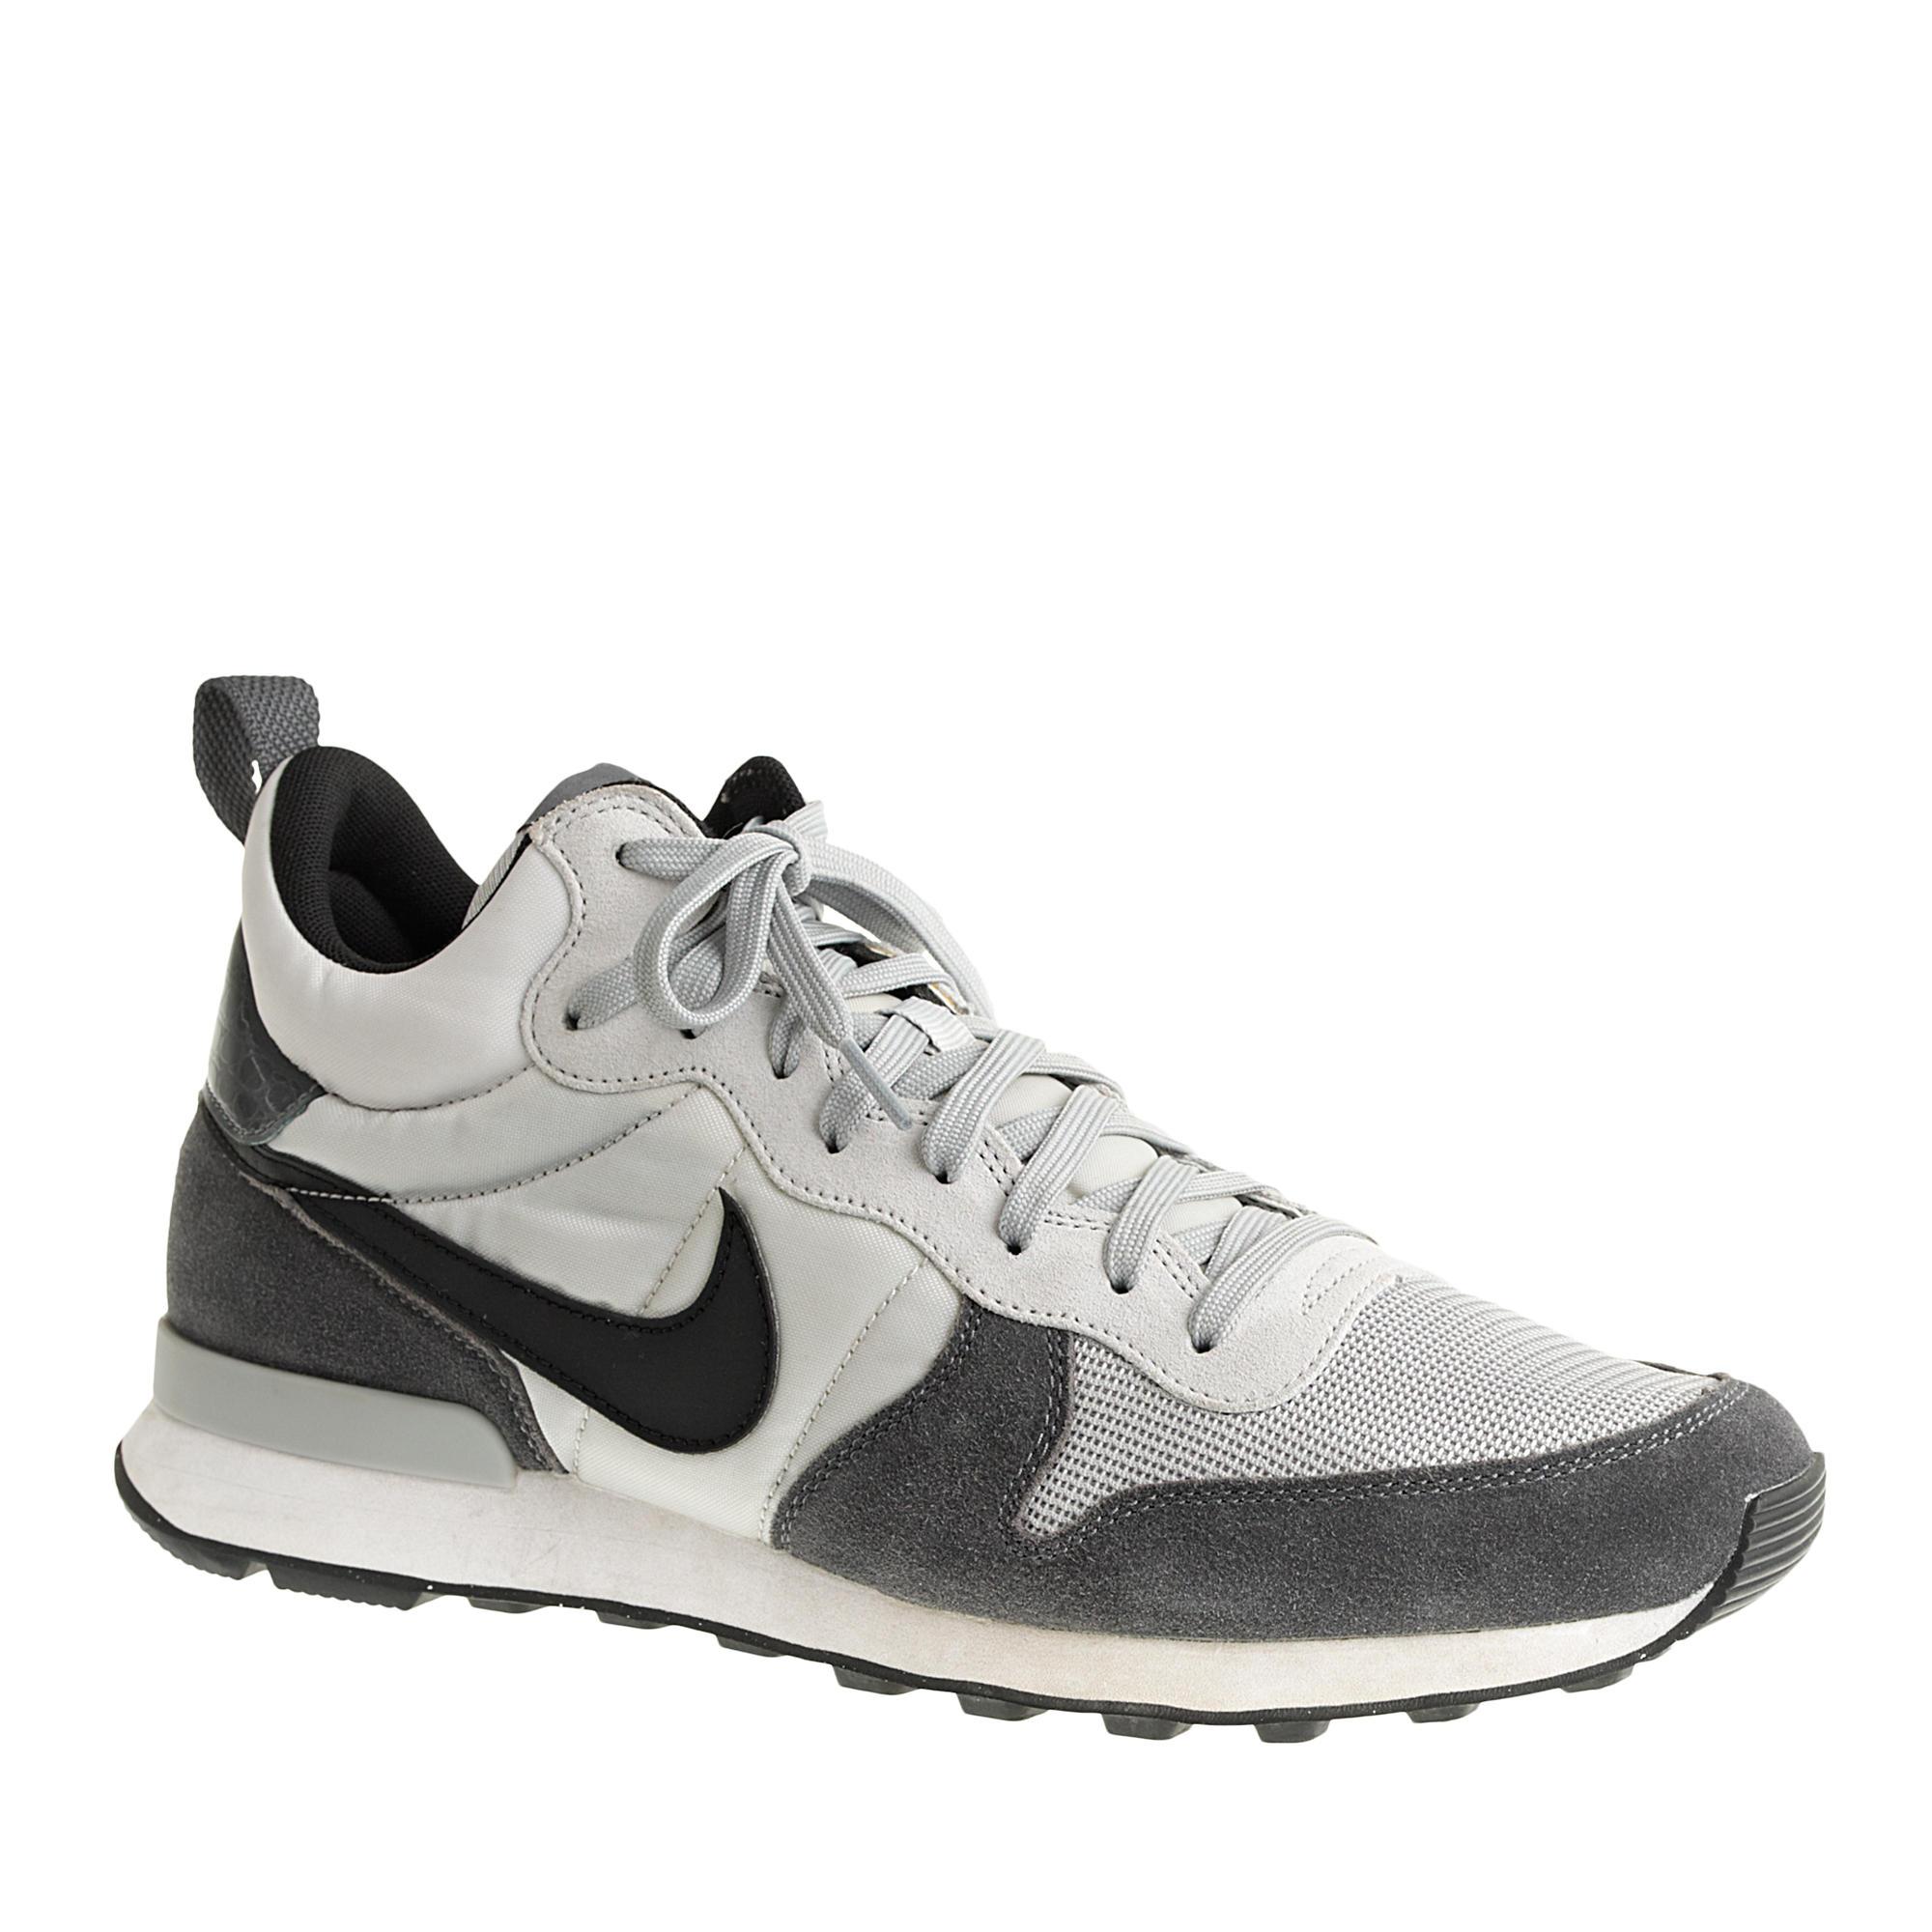 8d68007aded Lyst - J.Crew Men s Nike Internationalist Mid Sneakers in Gray for Men